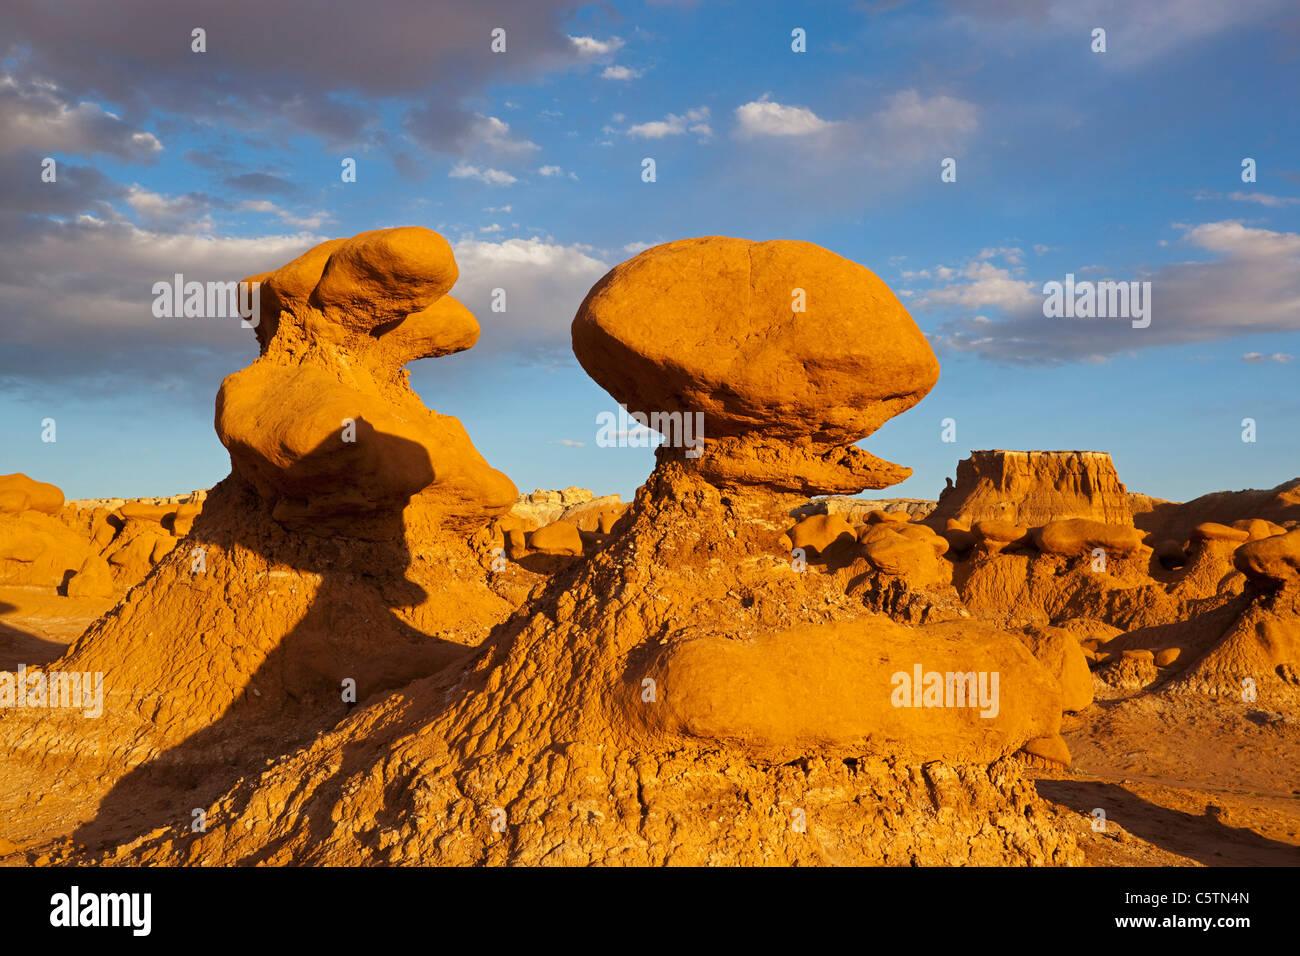 USA, Utah, Goblin Valley, San Rafael Swell, Rock formations - Stock Image